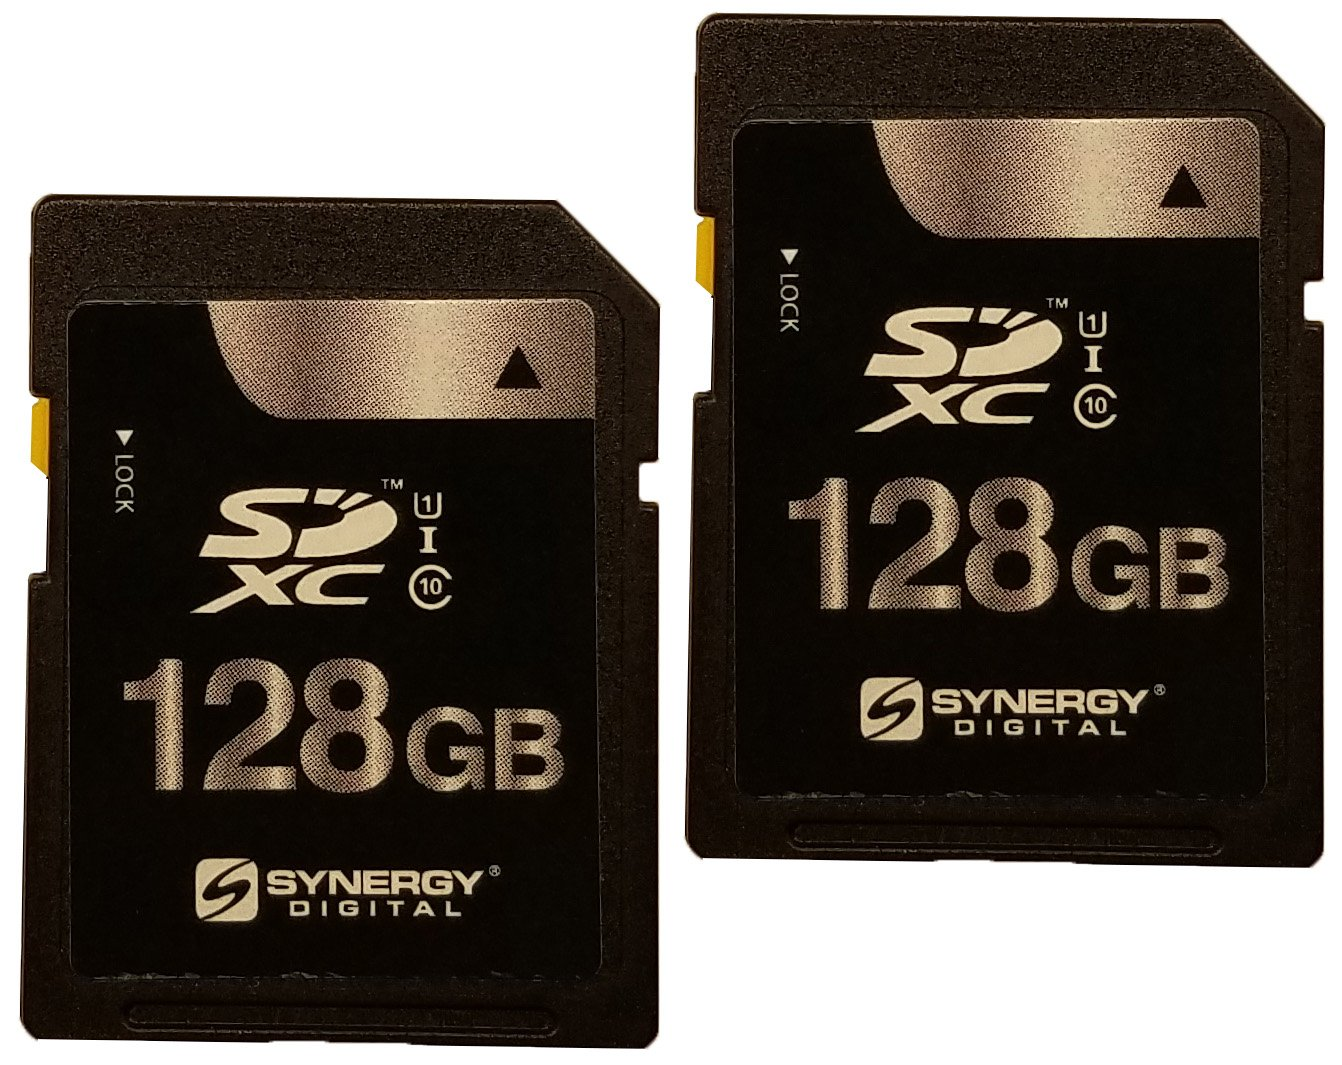 Panasonic Lumix DC-GH5 Digital Camera Memory Card 2 x 128GB Secure Digital Class 10 Extreme Capacity (SDXC) Memory Card (2 Pack)